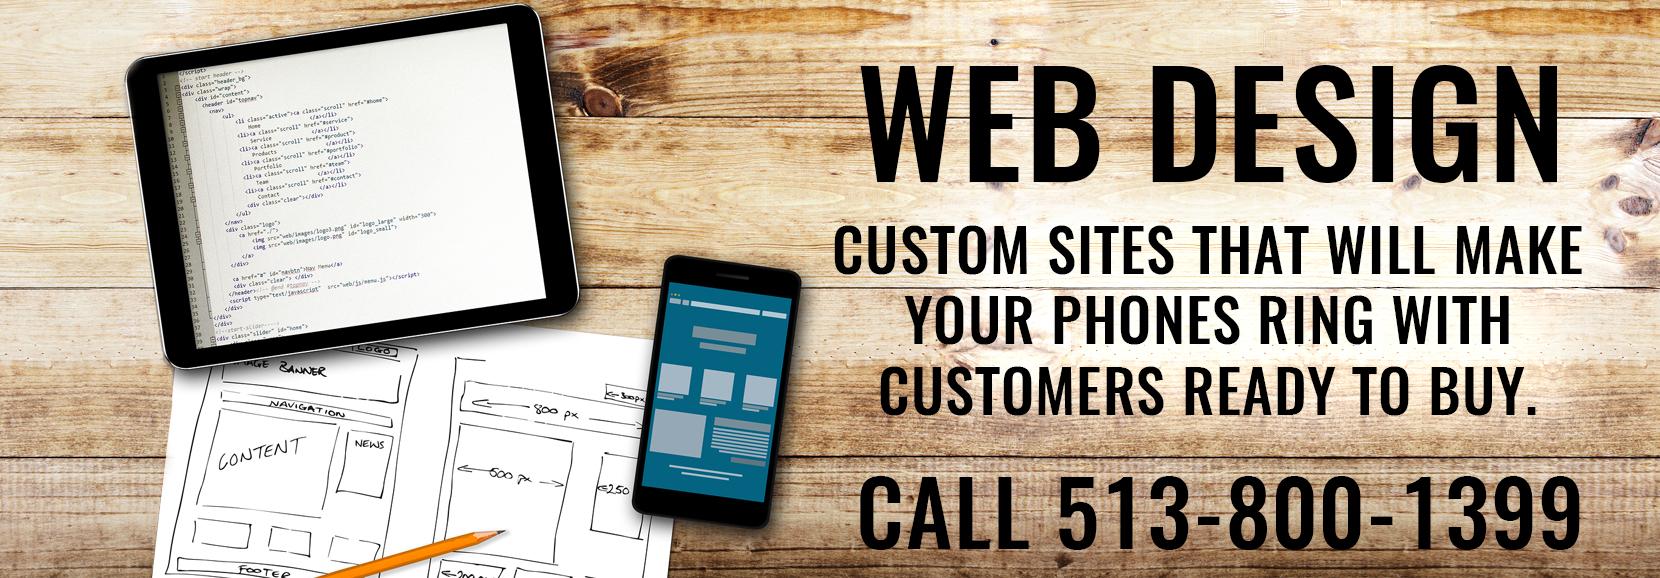 videoproductioncincinnati web design slider